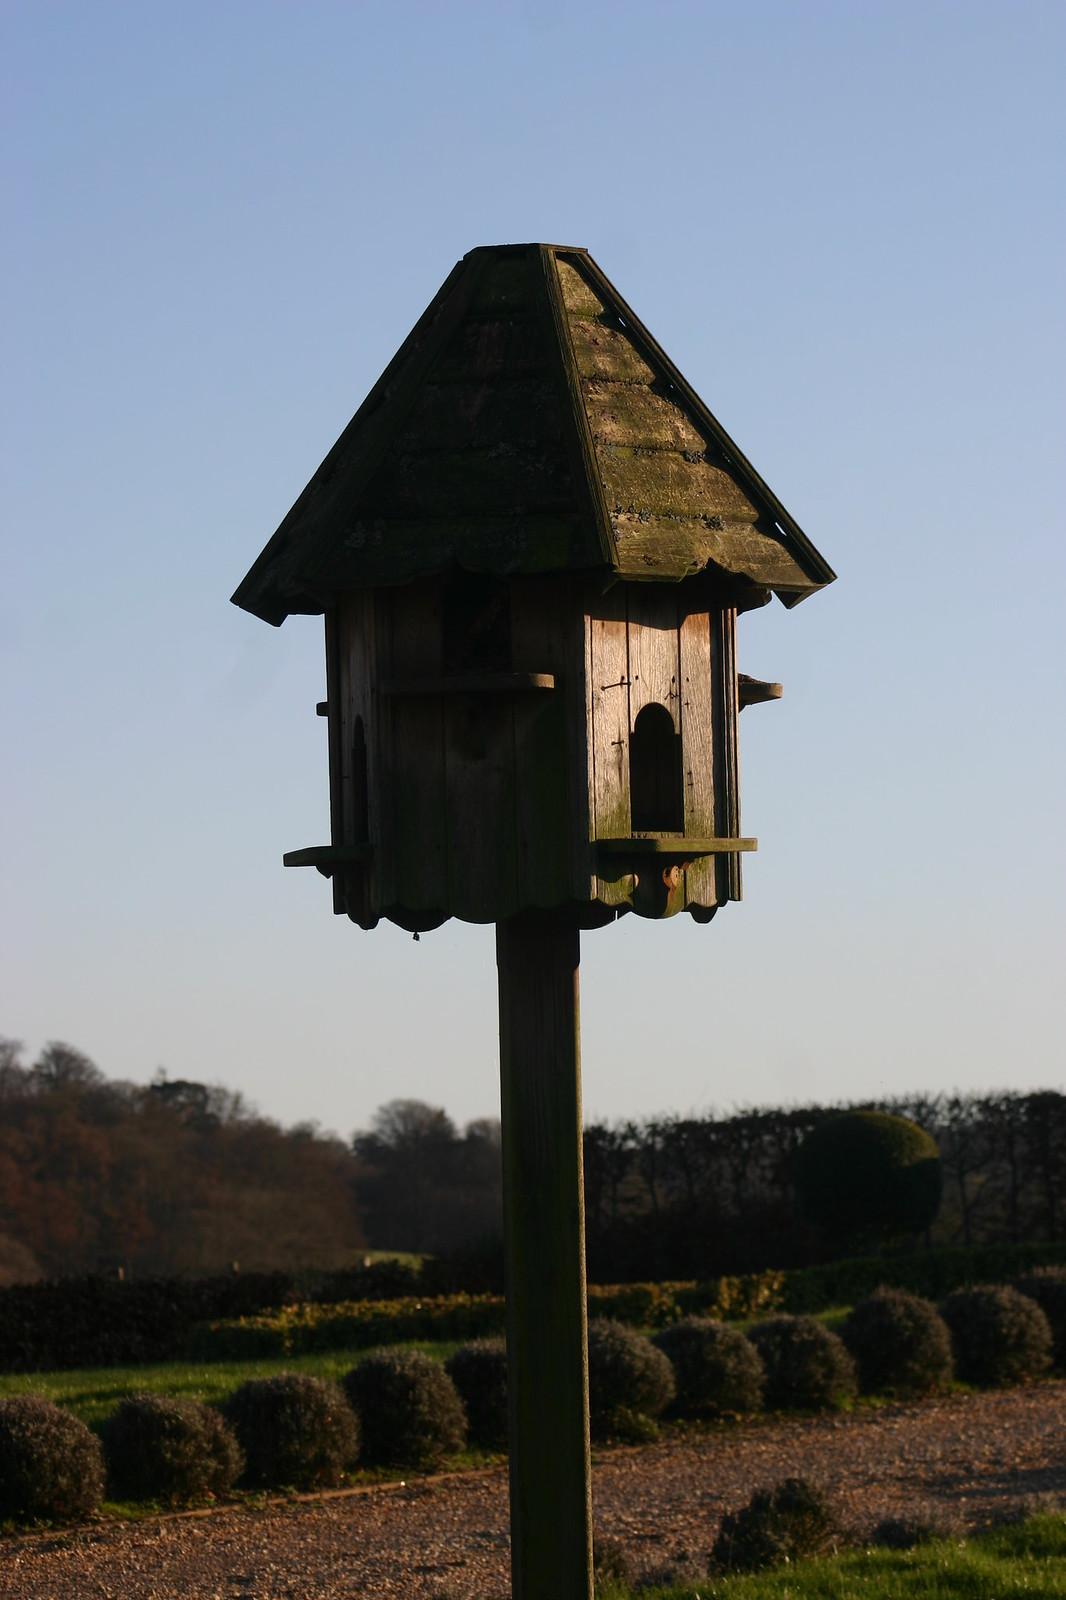 Bewl Oast Birdhouse